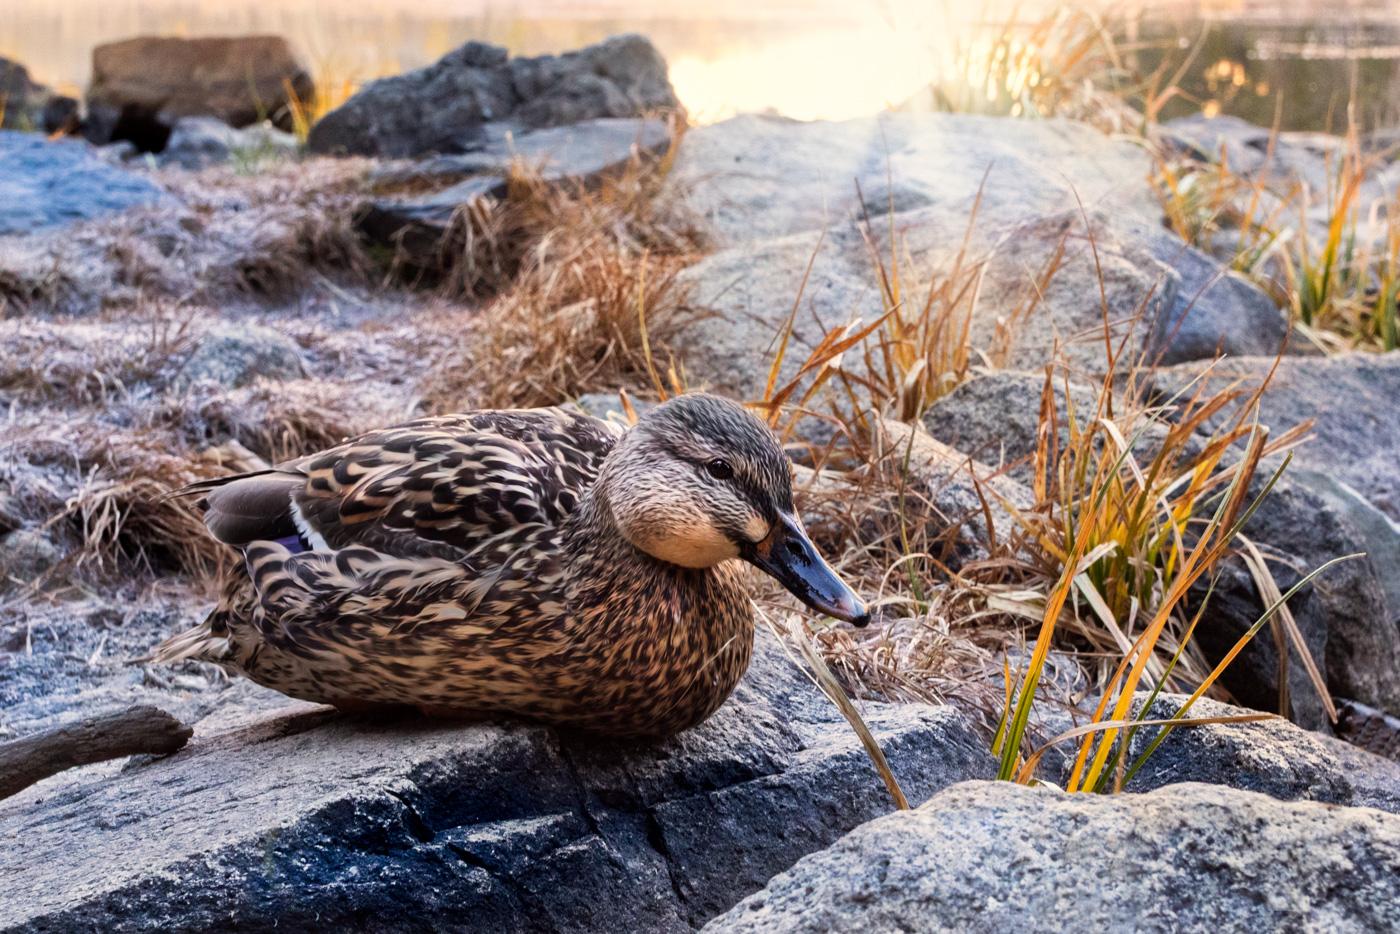 My Sunrise Duck Friend at Parker Lake